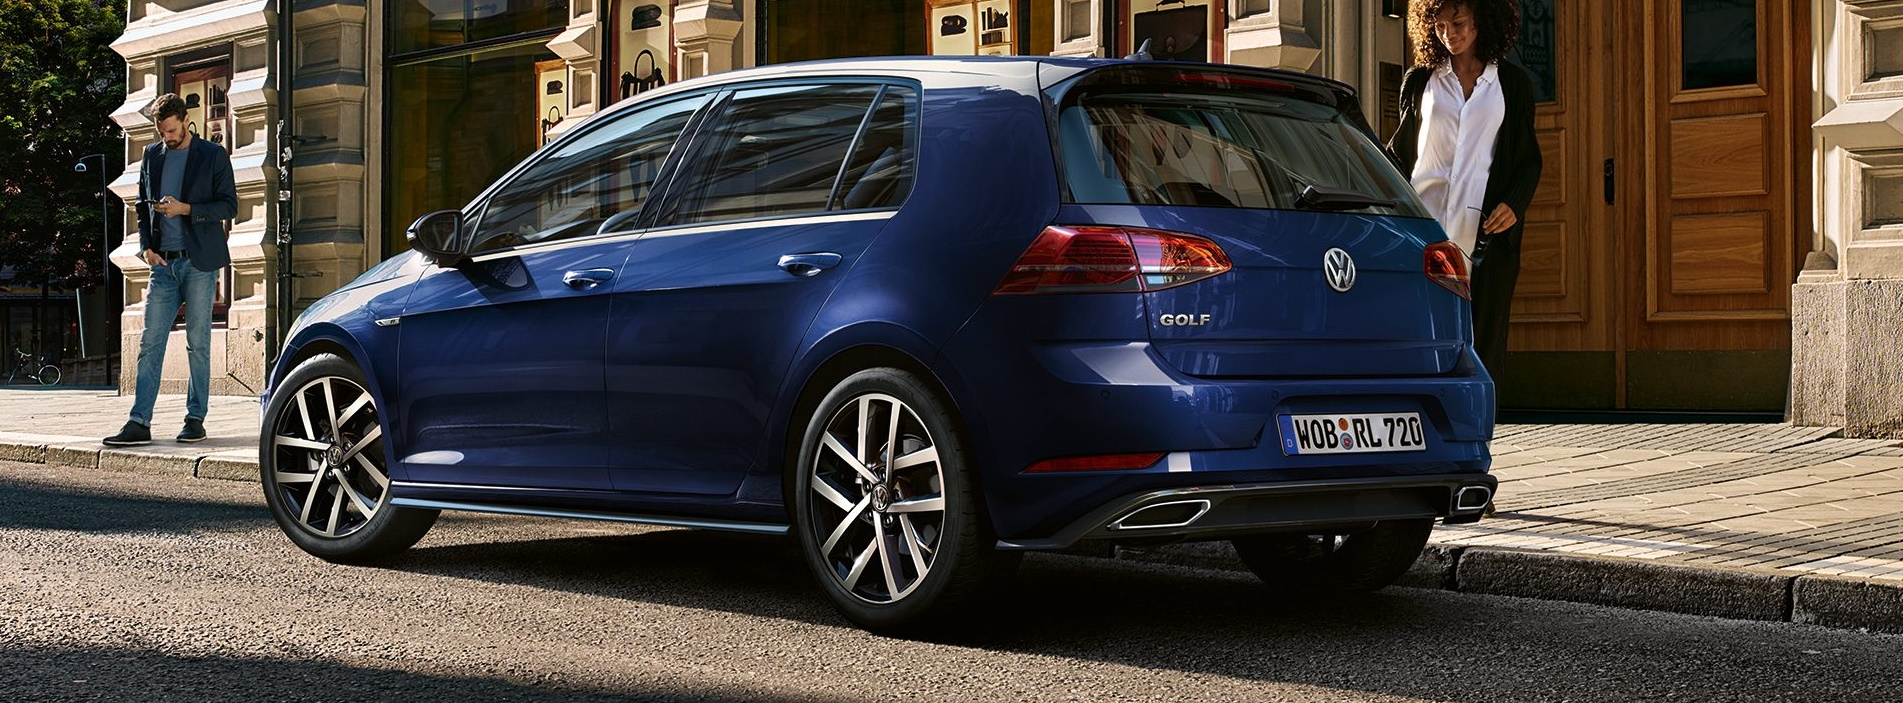 Noleggio Lungo Termine Volkswagen Golf 16 Tdi Business Bmt Qj Rent